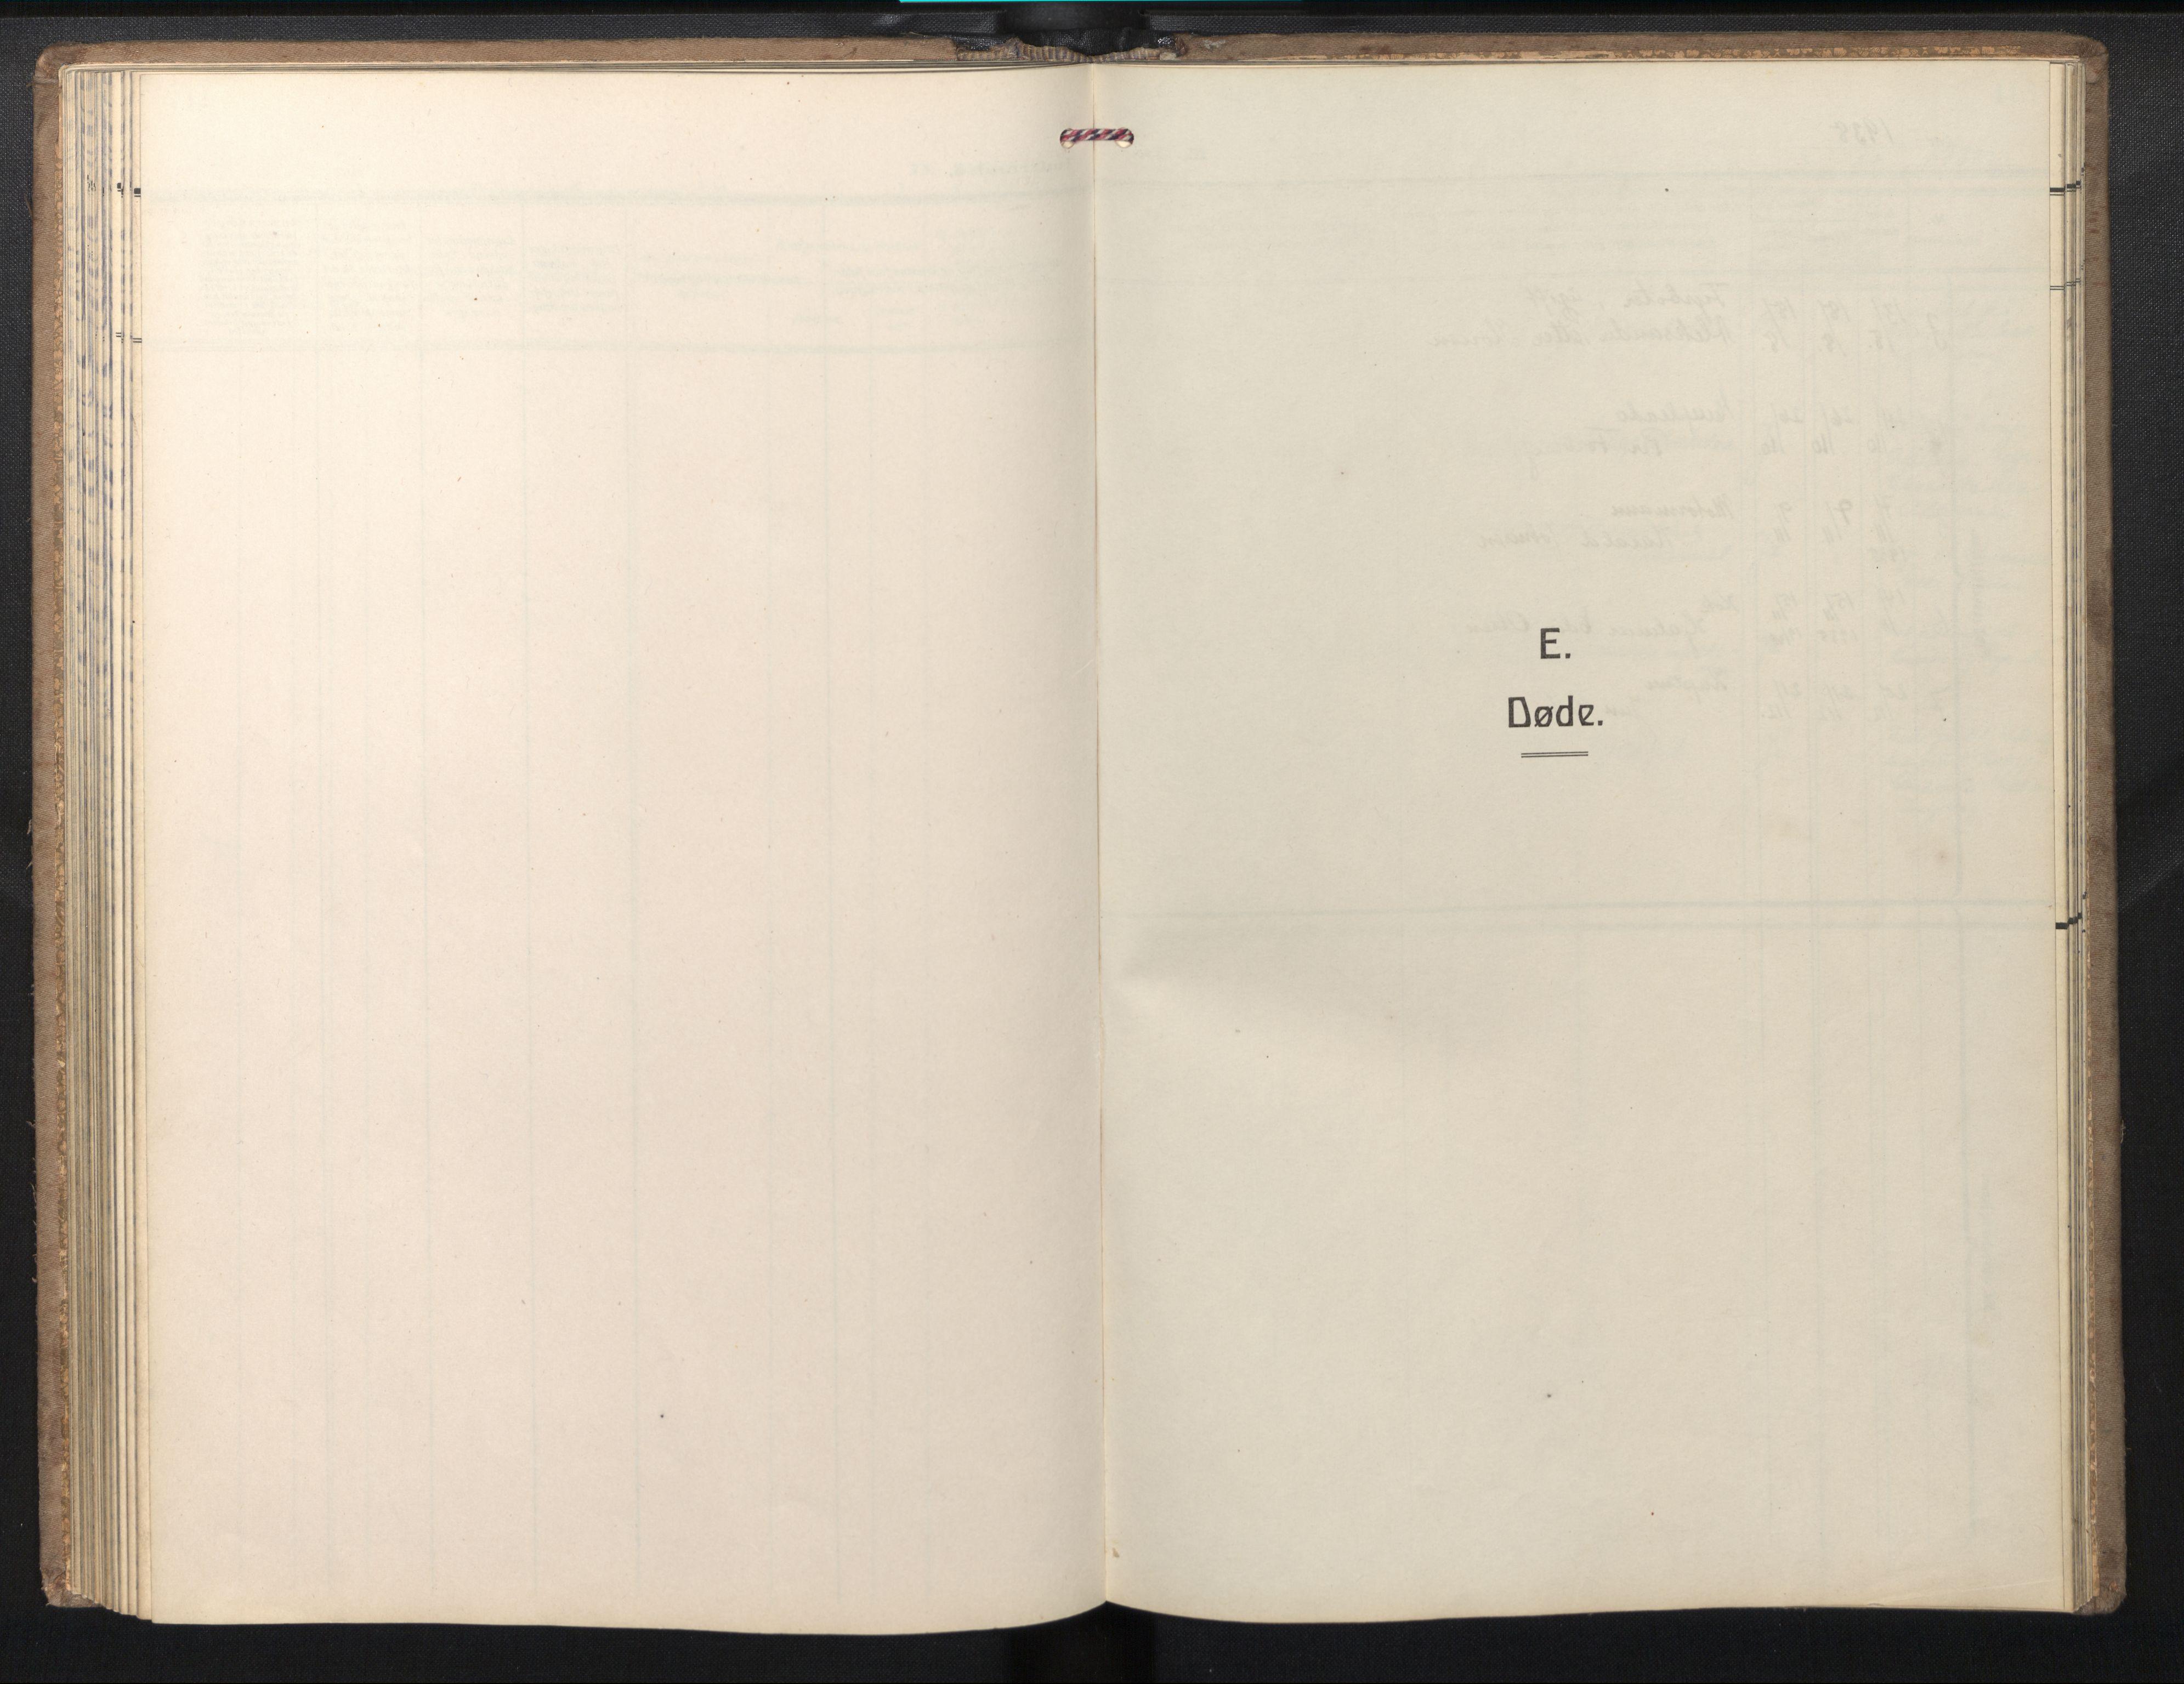 SAB, Den norske sjømannsmisjon i utlandet/Syd-Amerika (Buenos Aires m.fl.), H/Ha/L0004: Ministerialbok nr. A 4, 1938-1978